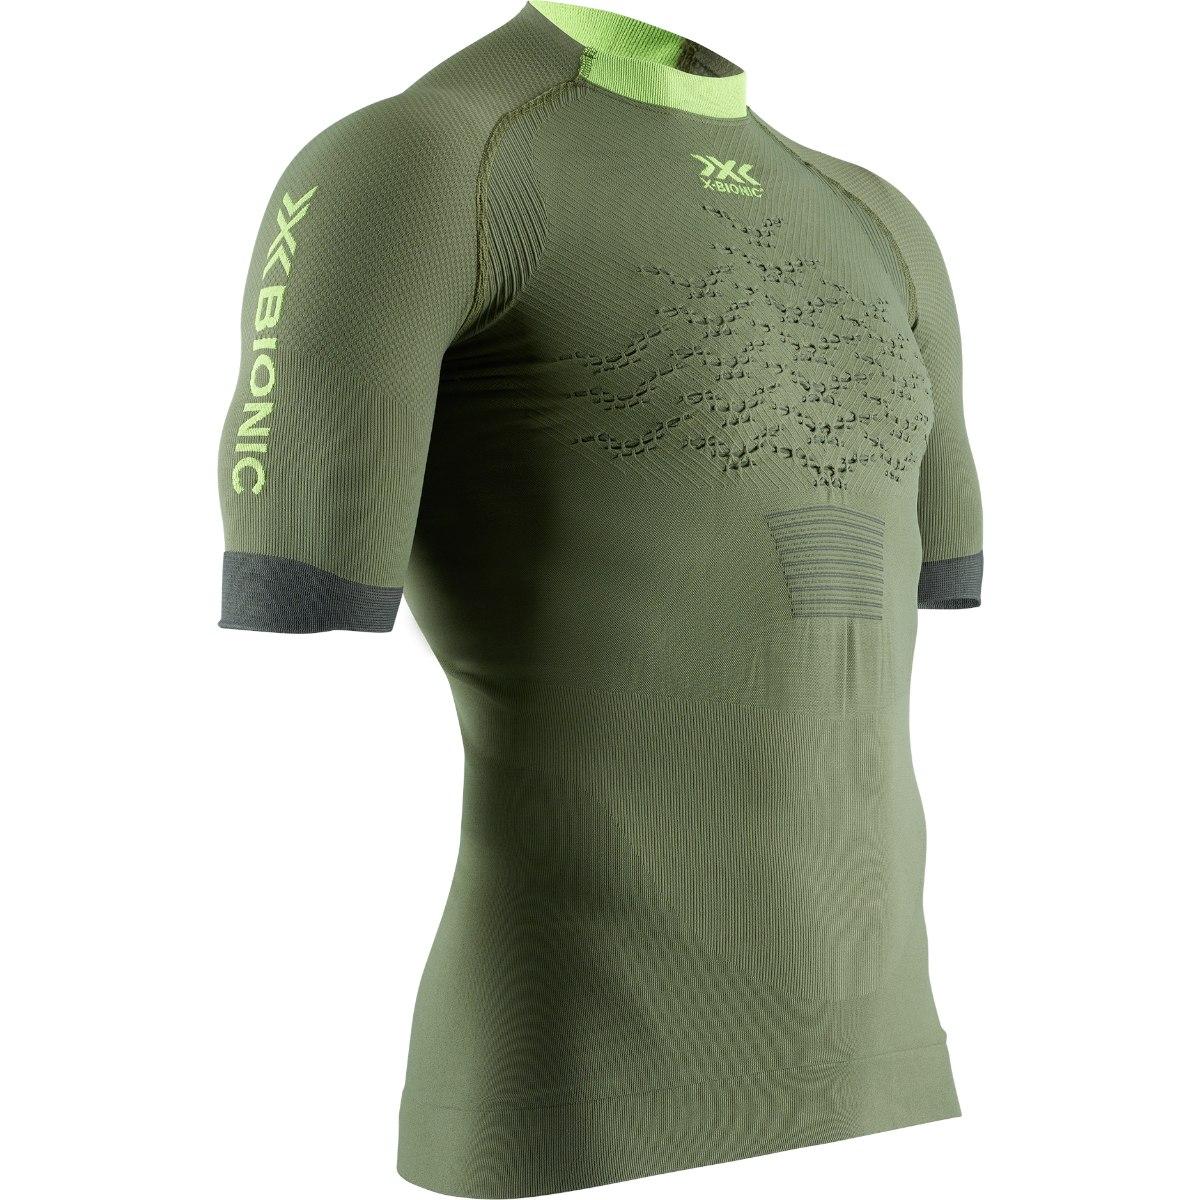 X-Bionic The Trick 4.0 Run Kurzarm-Laufshirt für Herren - olive green/phyton yellow